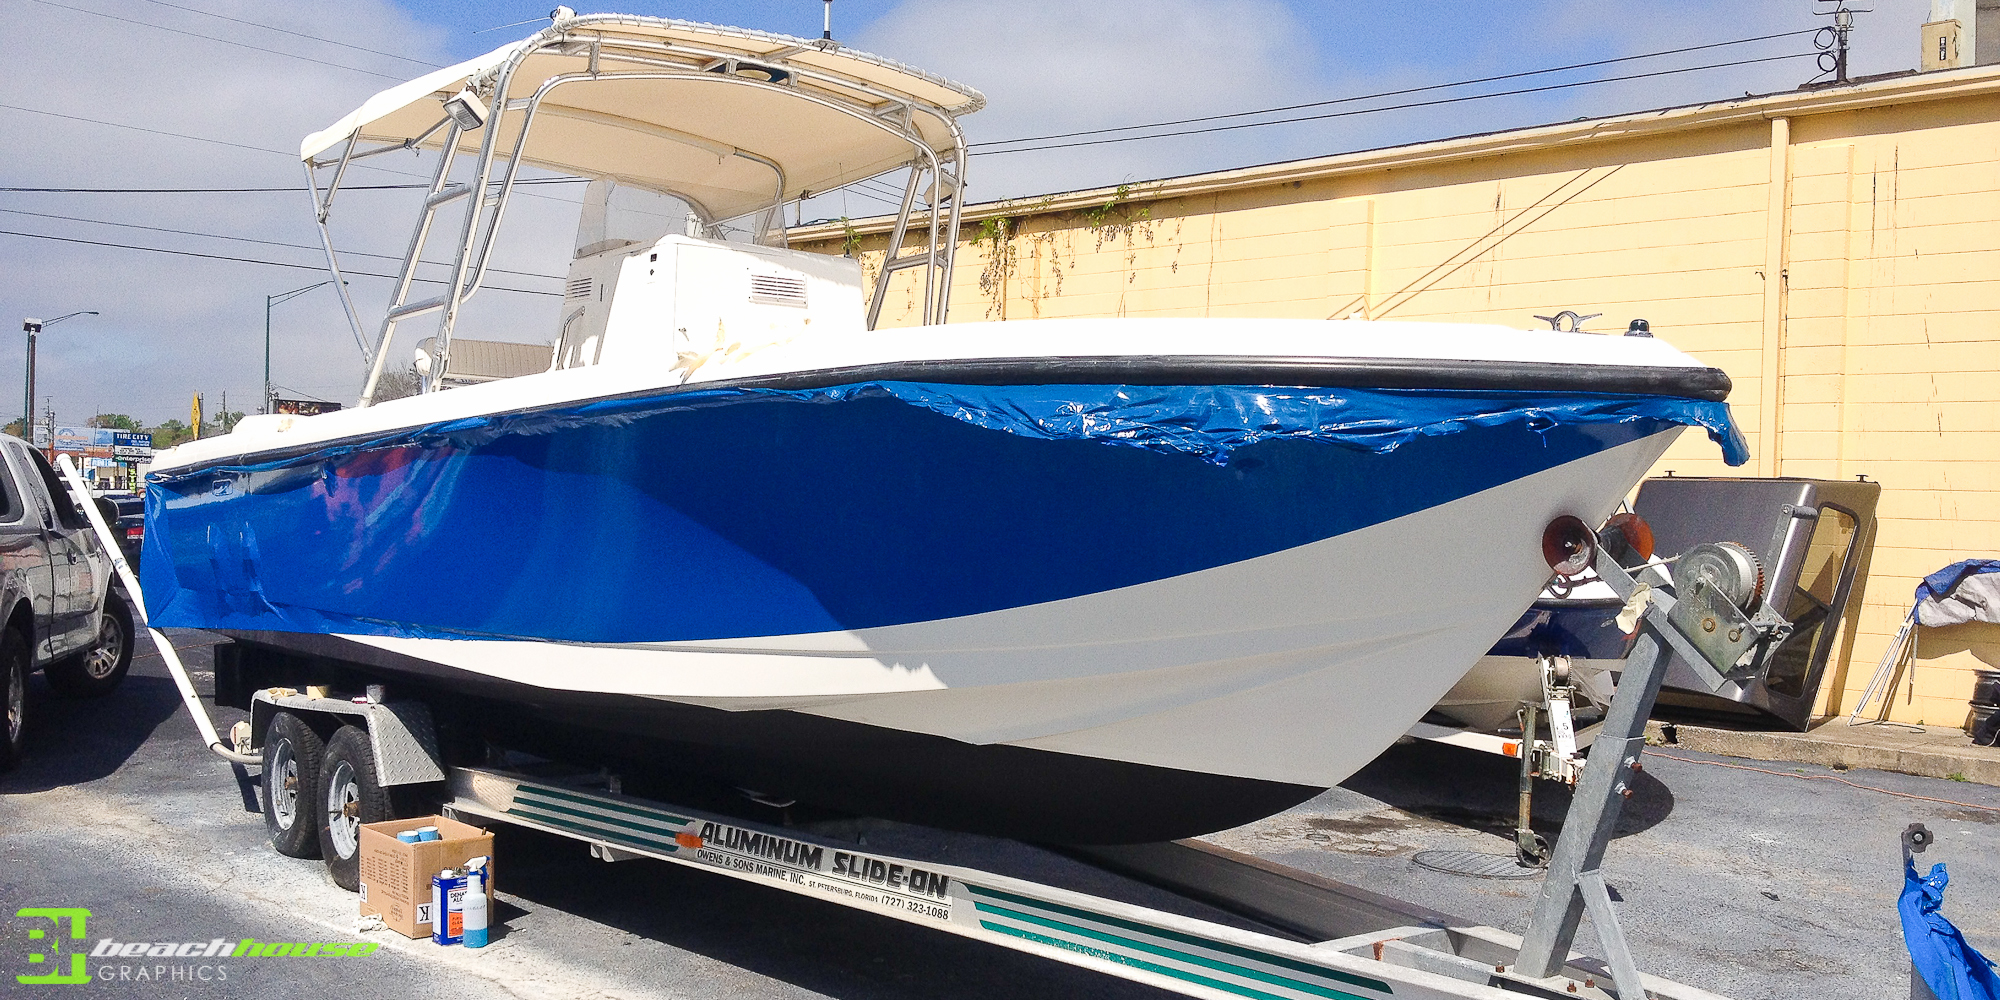 Vinyl Boat Decal Vehicle Wraps 386 256 0998